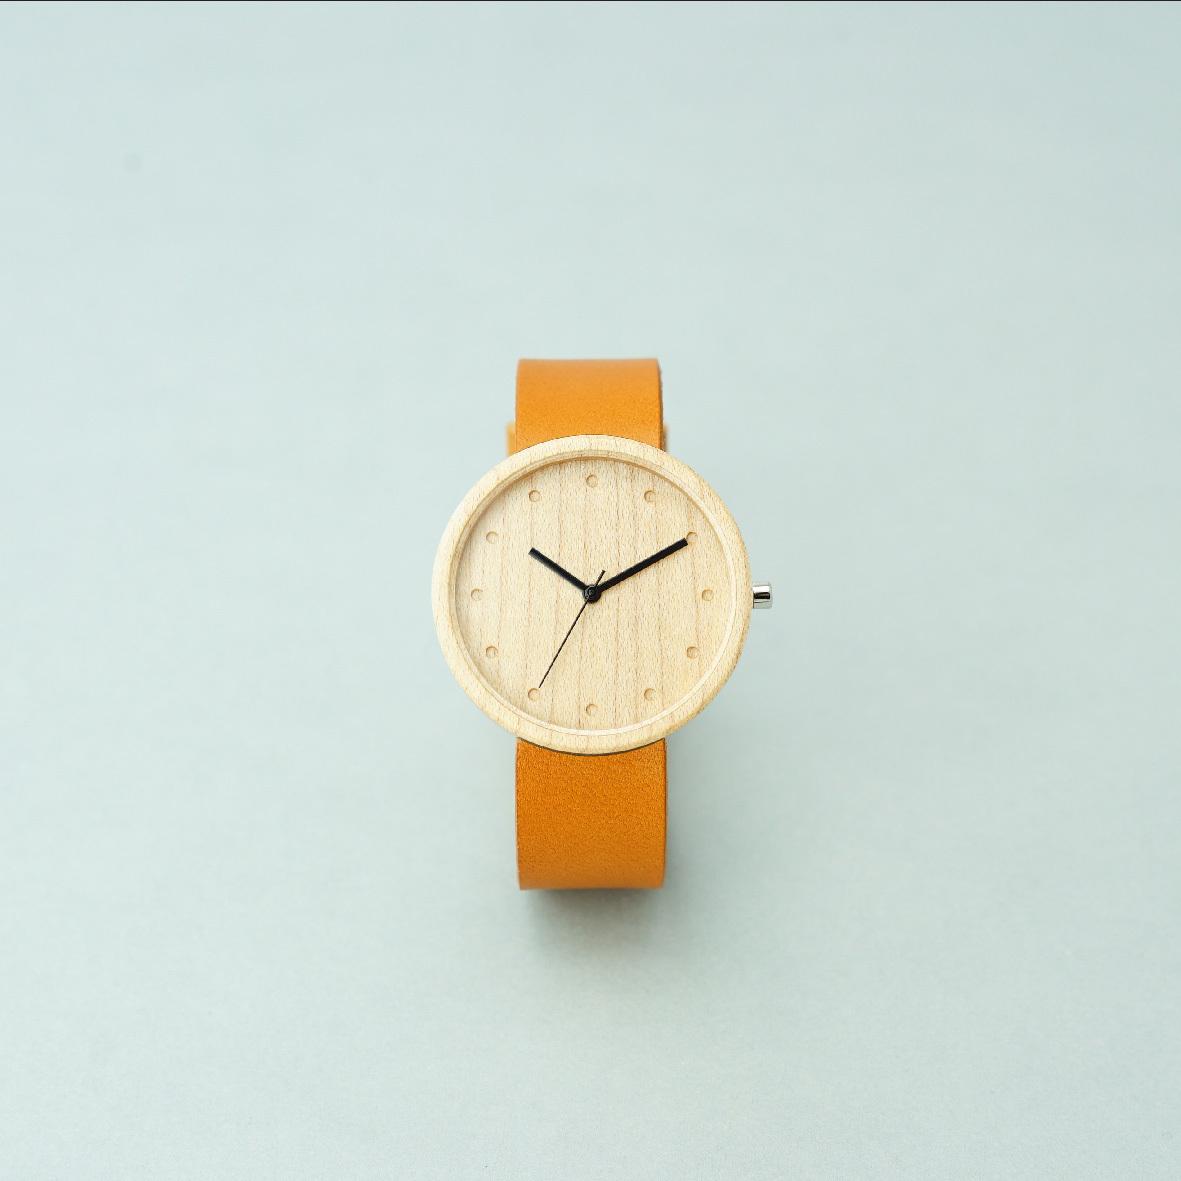 Maple wood - Camel - L